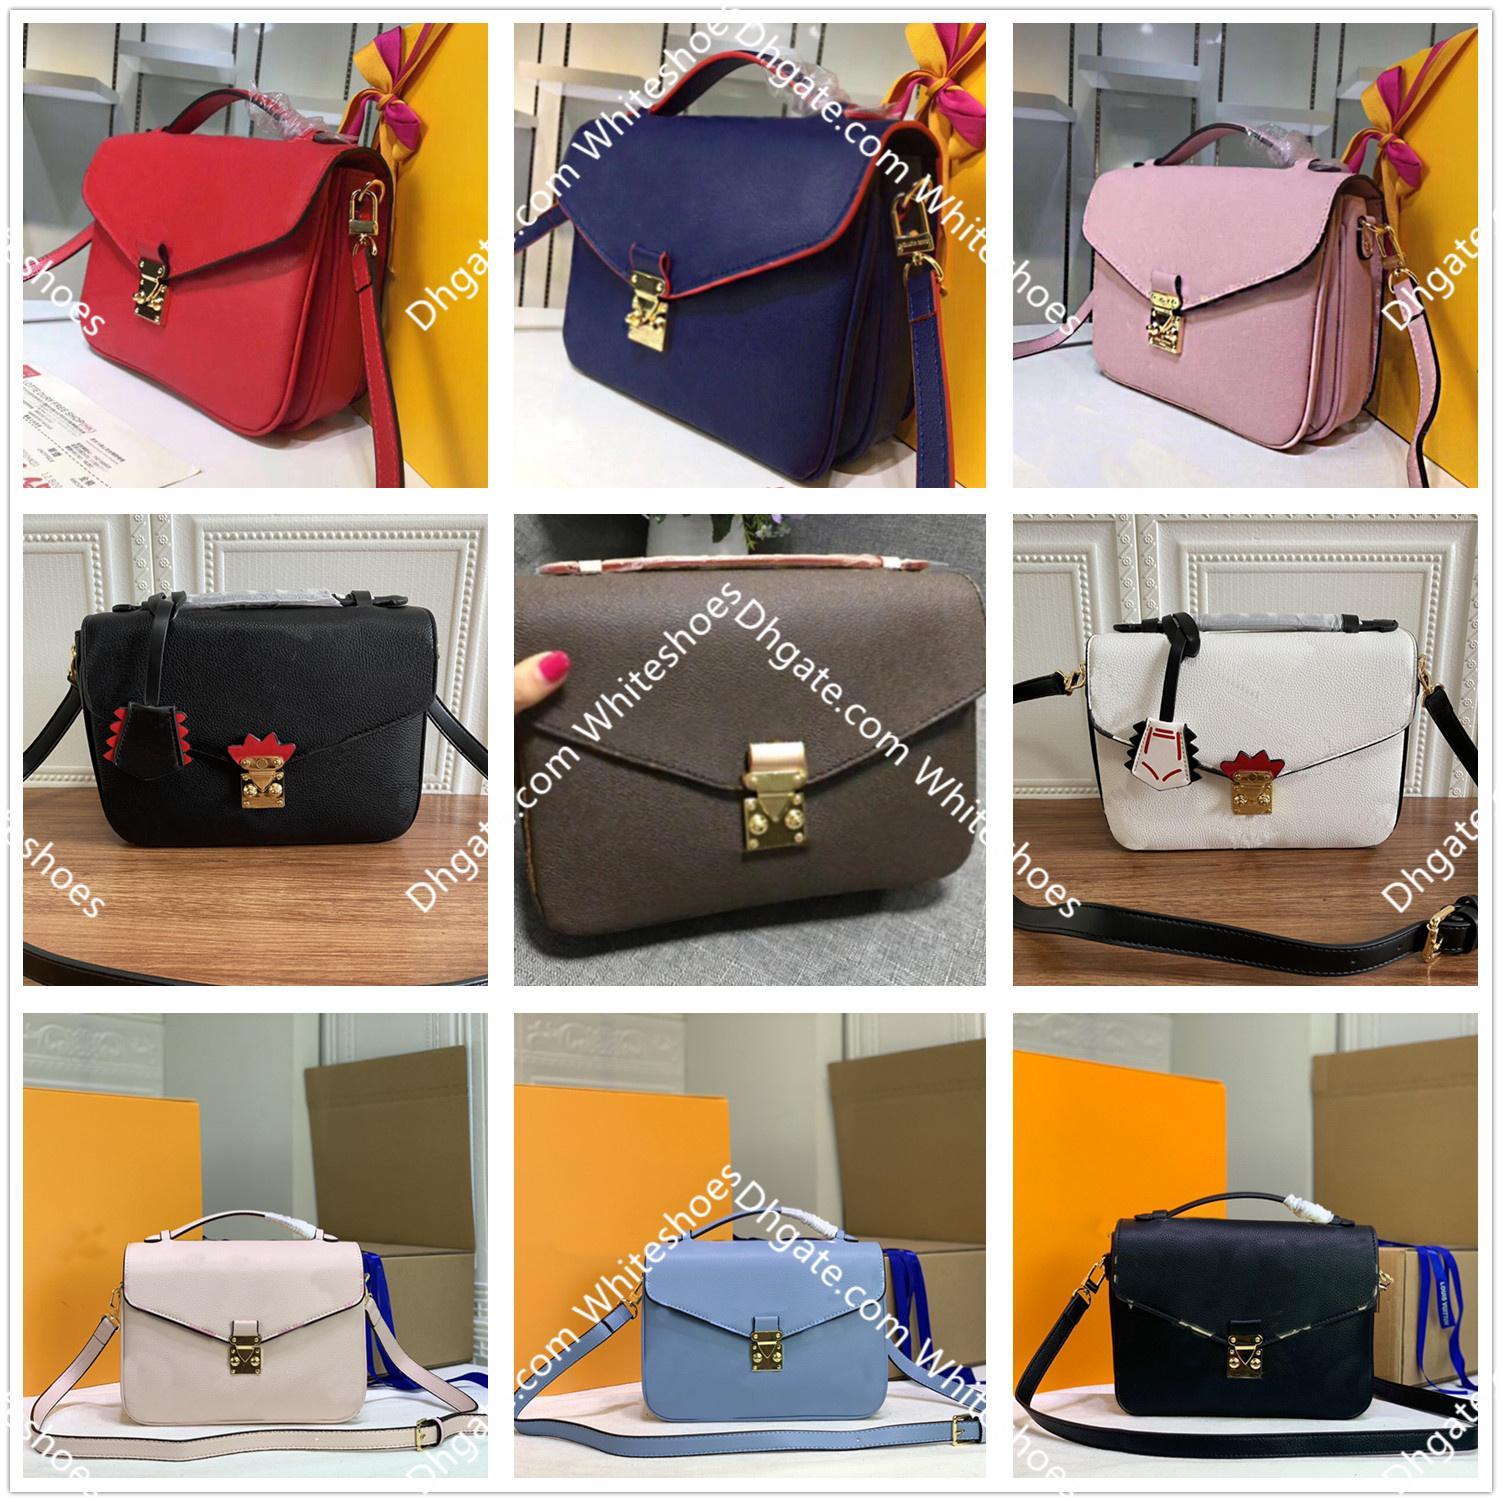 Classic Impressão Flor Pochette Metis Totes Luxurys Designers Messenger Bolsa de Couro Real Mulheres bolsas bolsas bolsas de bolsas Crossbody Bags M40780